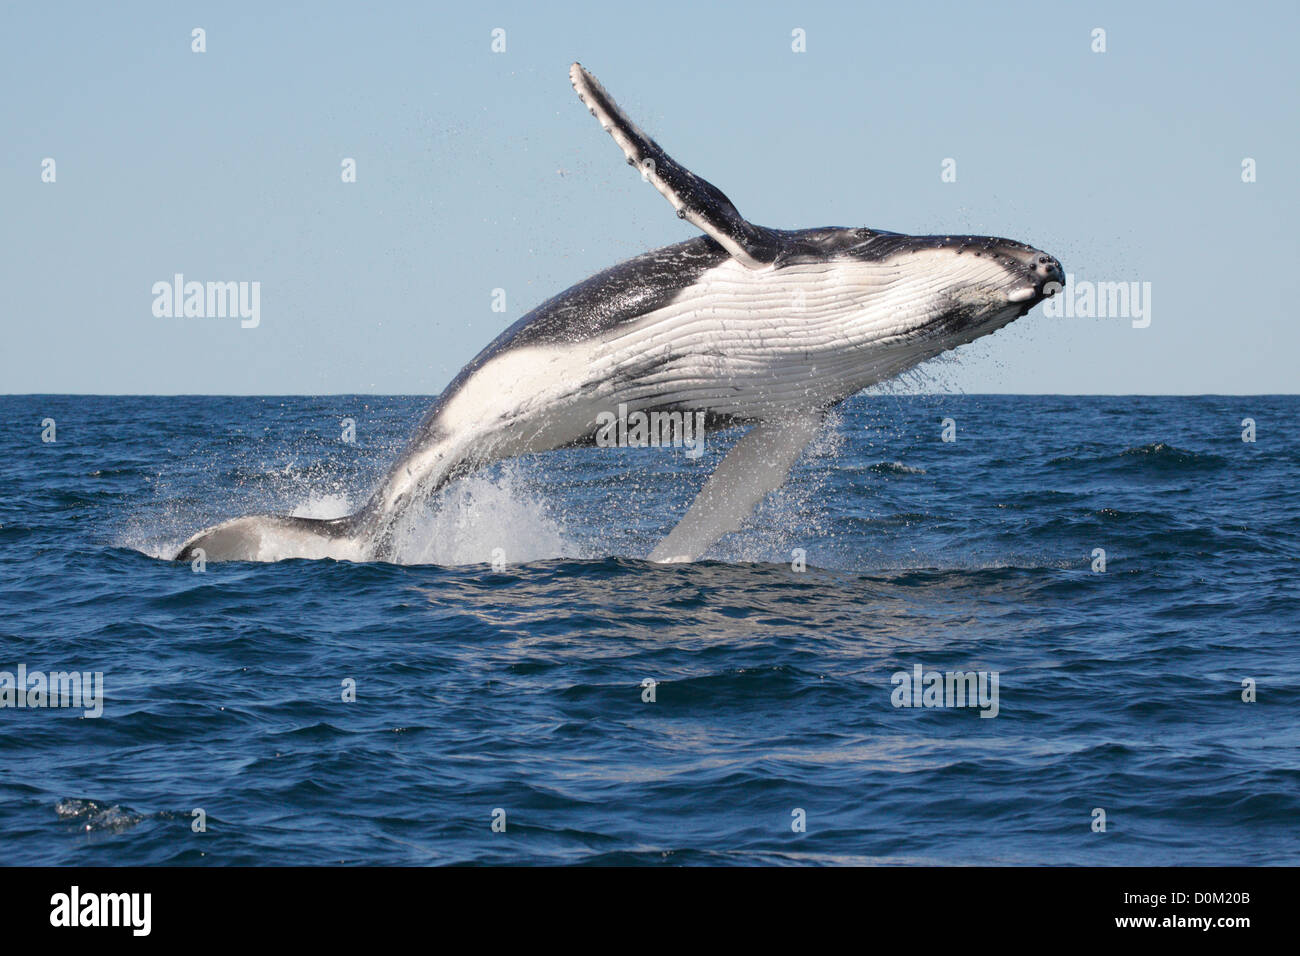 Jeune Baleine à bosse (Megaptera novaeangliae) violer, sautant à Byron Bay, New South Whales, Australie Photo Stock